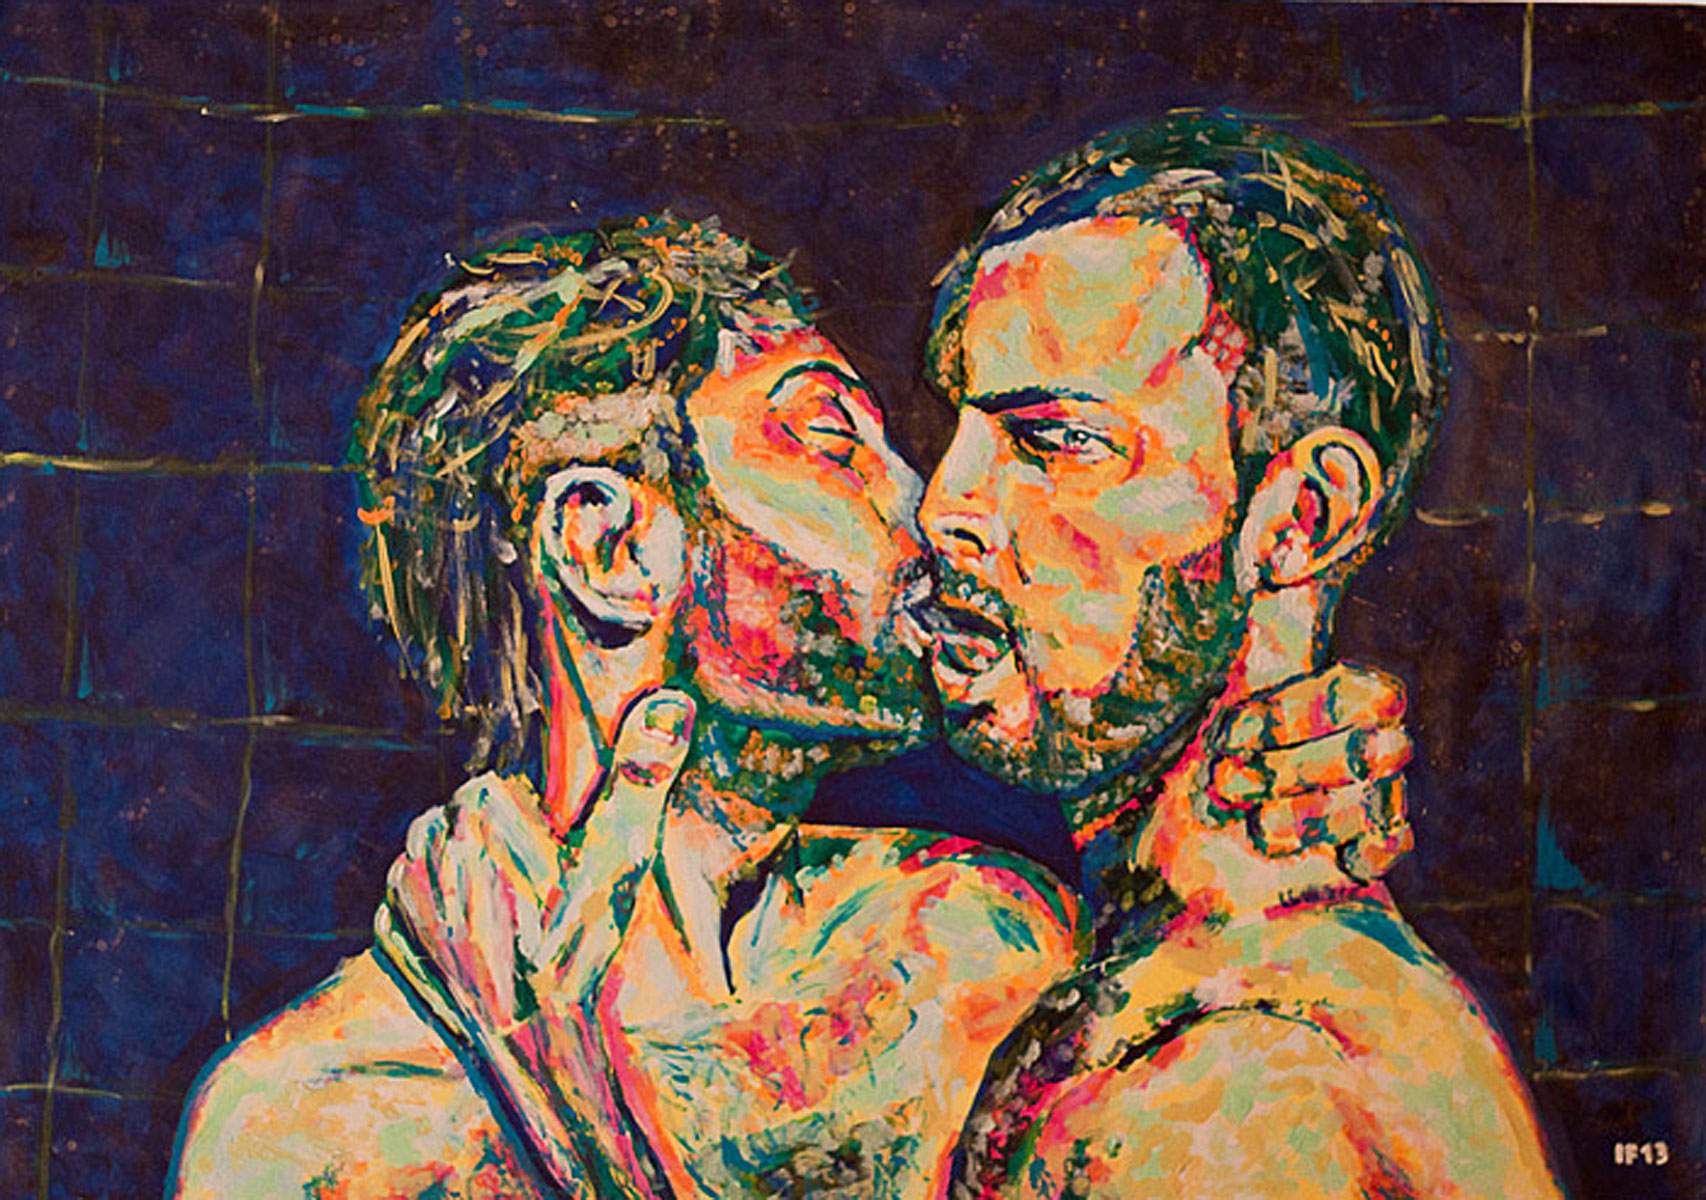 People Never Met (2013) acrylic on canvas, 70x100